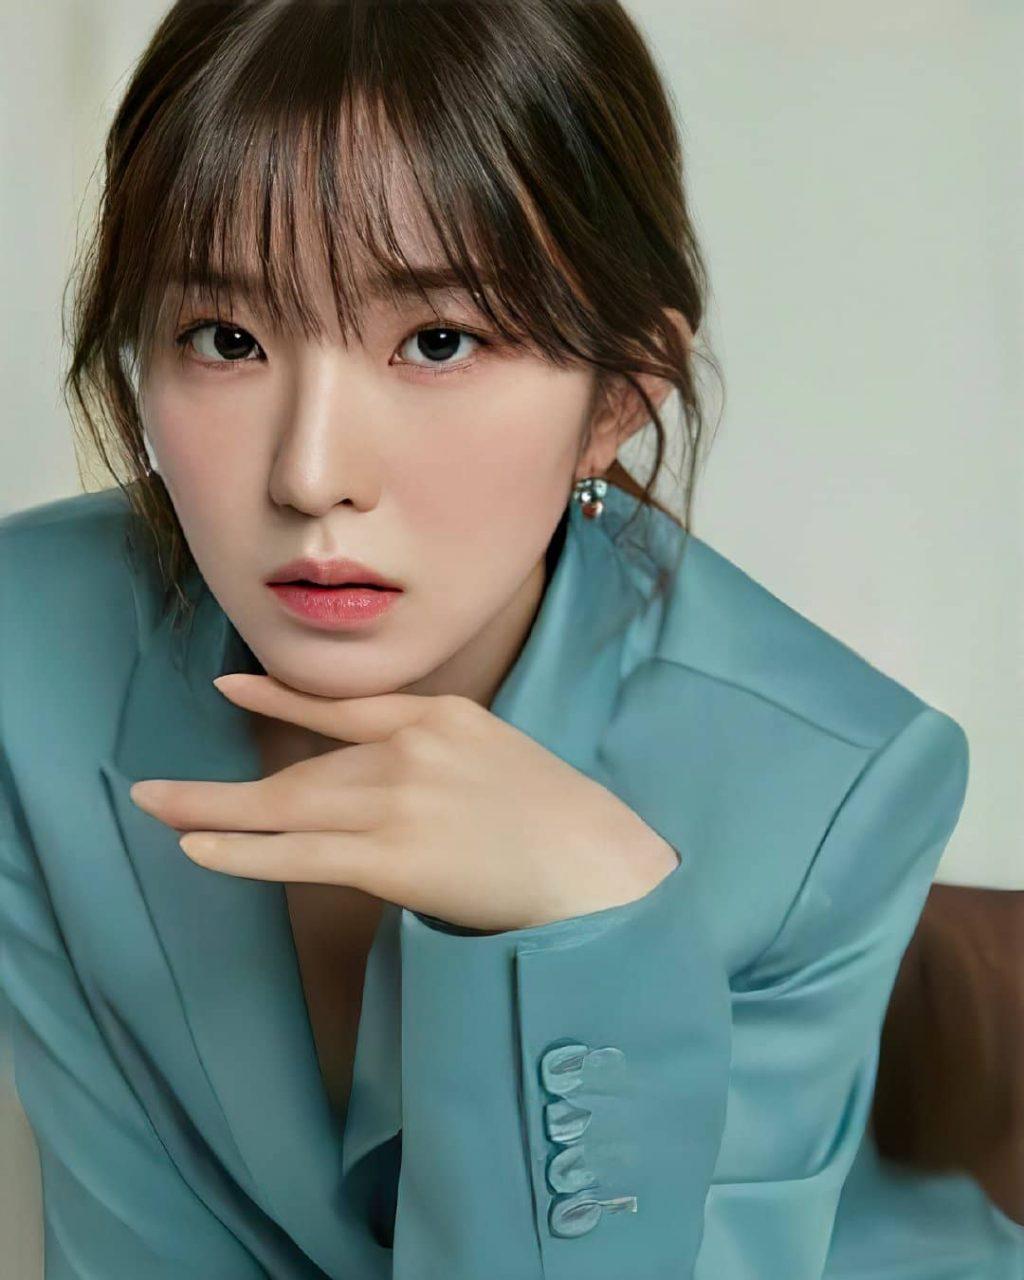 Irene mặc vest xanh.